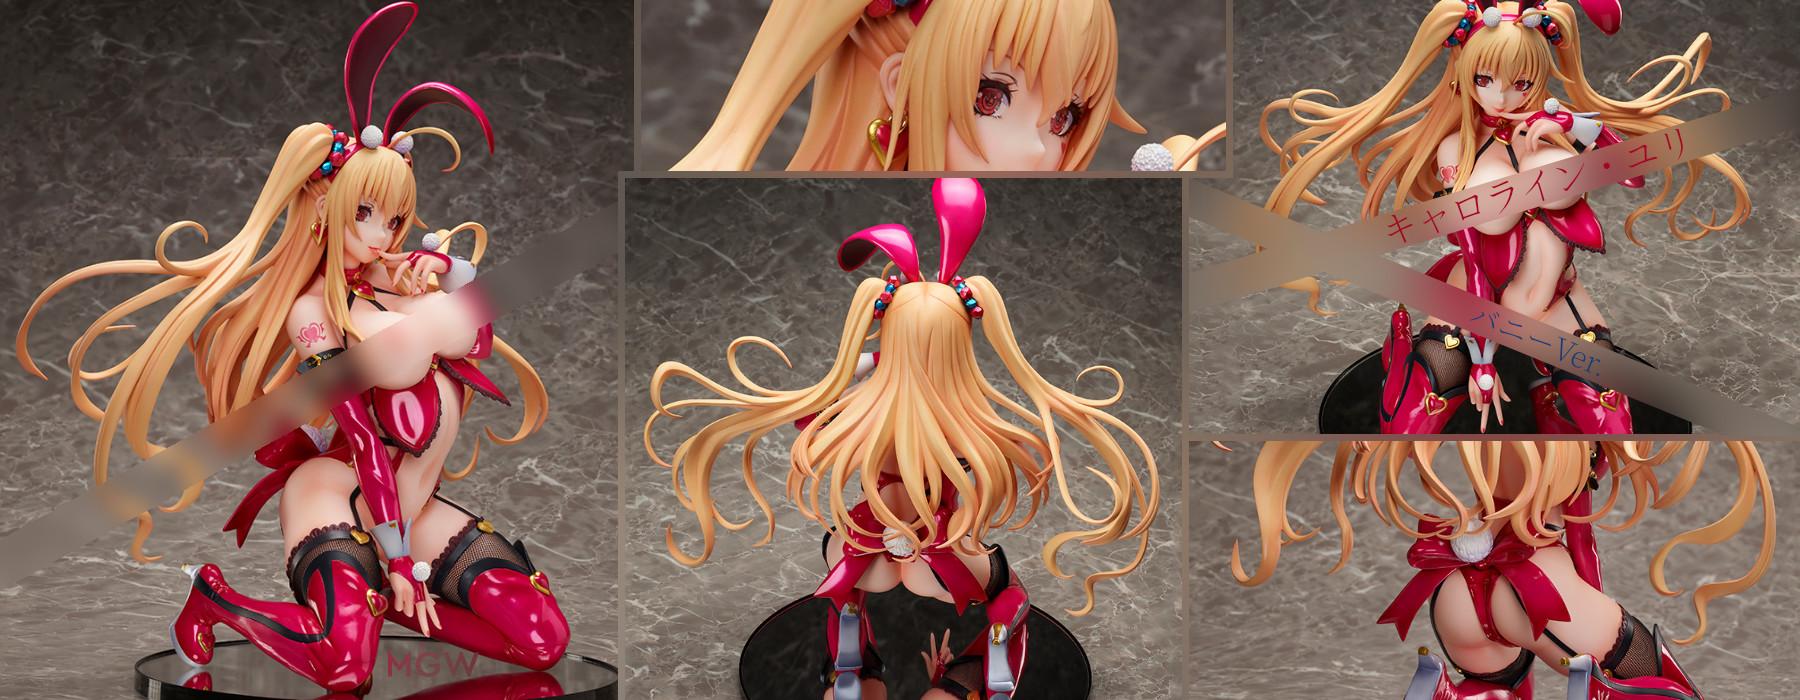 Caroline Yuri Bunny Ver. by BINDing from BINDing Creators Opinion MyGrailWatch Anime Figure Pre order Guide